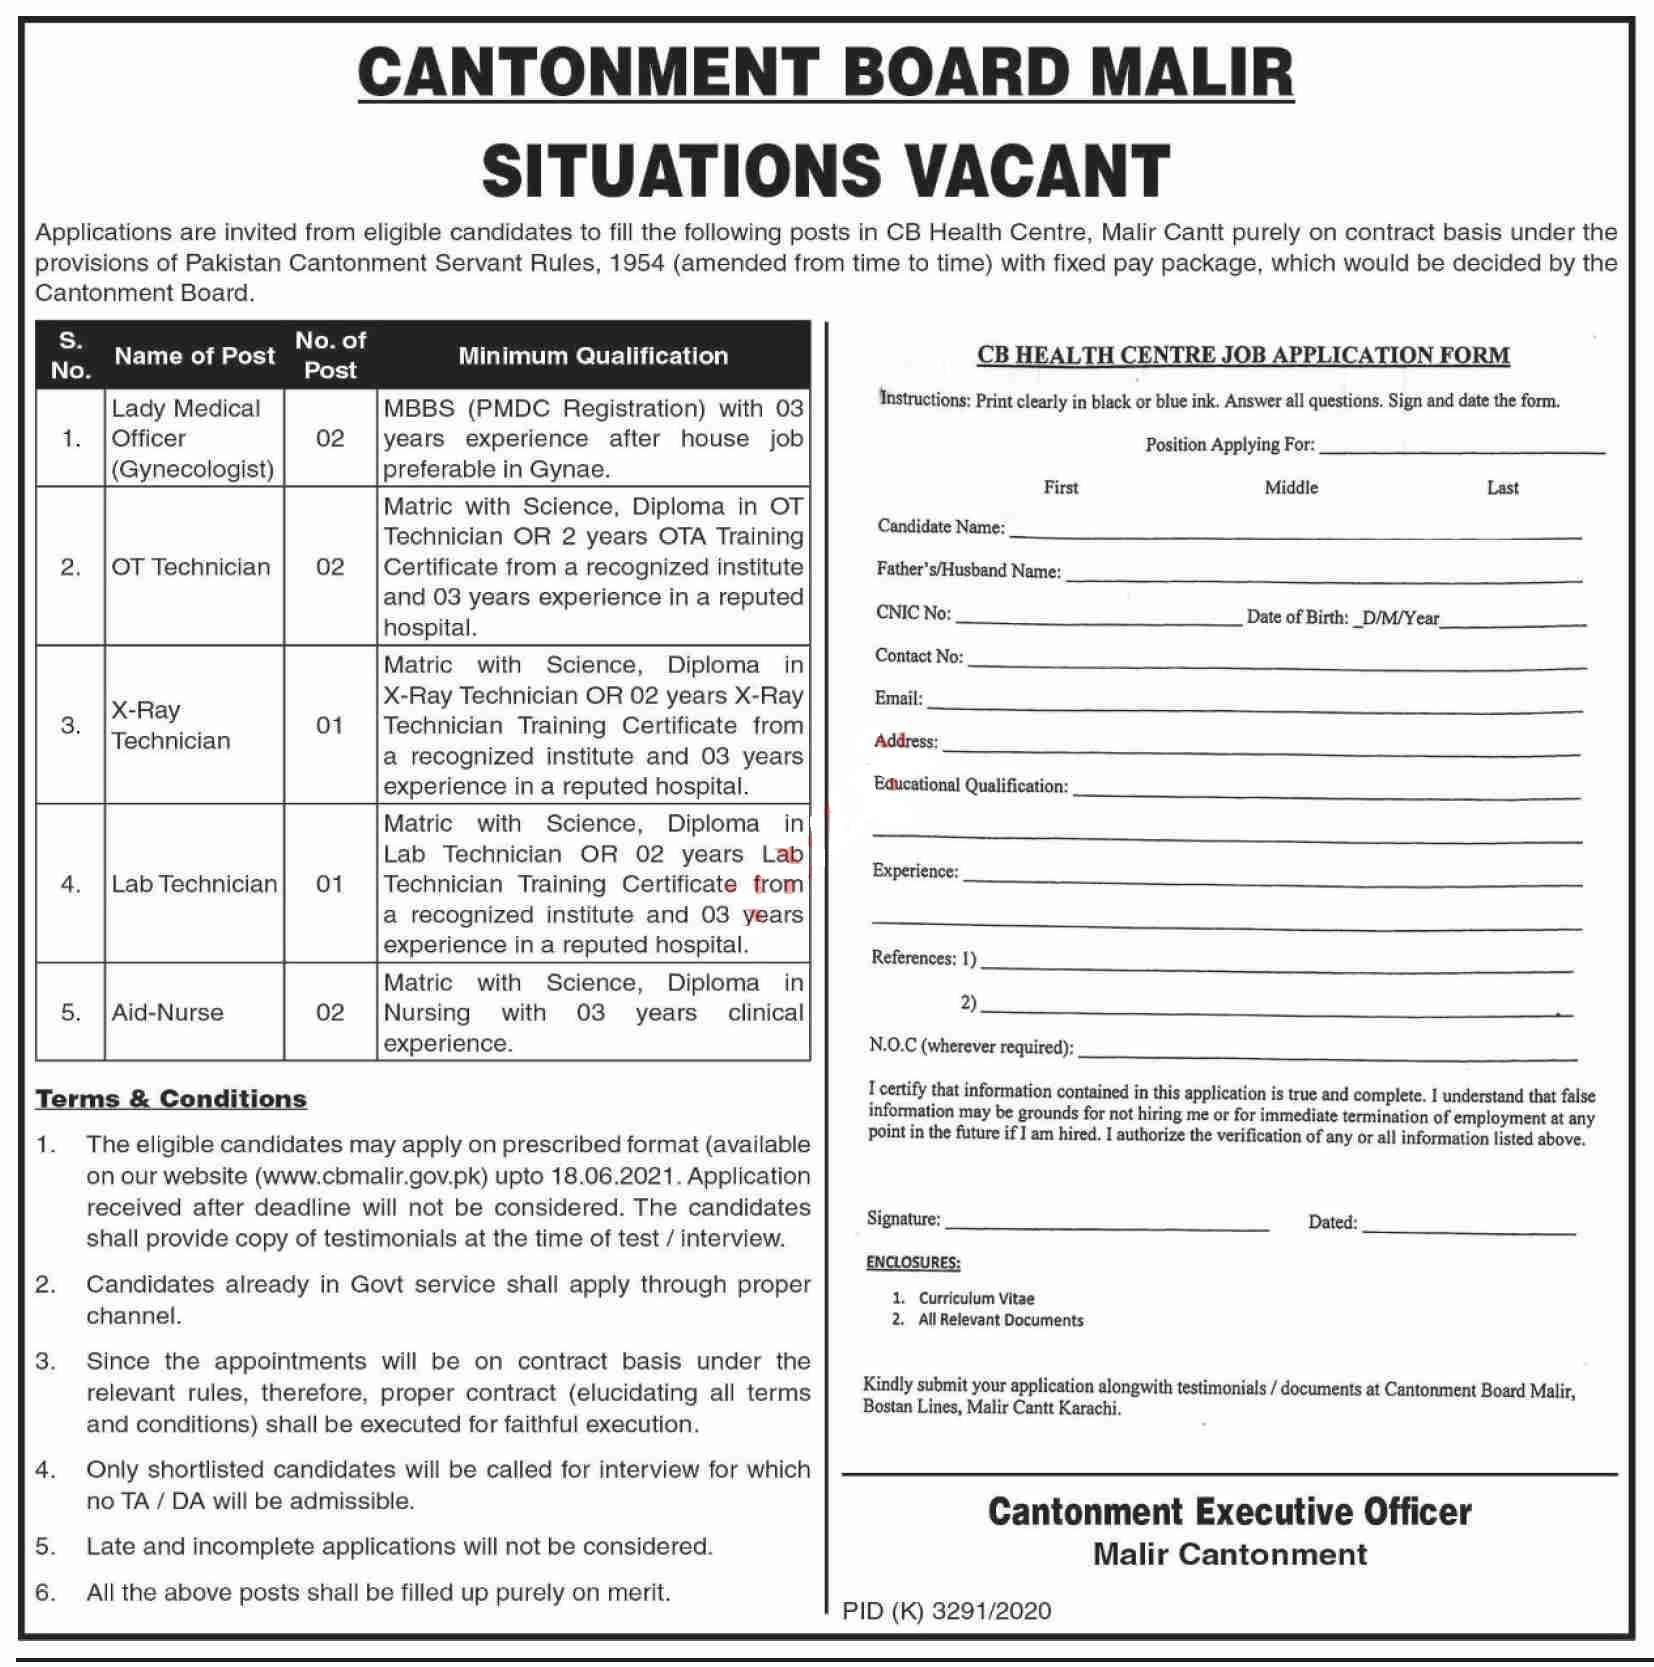 Cantonment Board Malir Jobs 2021 for Lady Medical Officer, Gynecologist, OT Technician, X Ray Technician, Lab Technician, Aid Nurse.